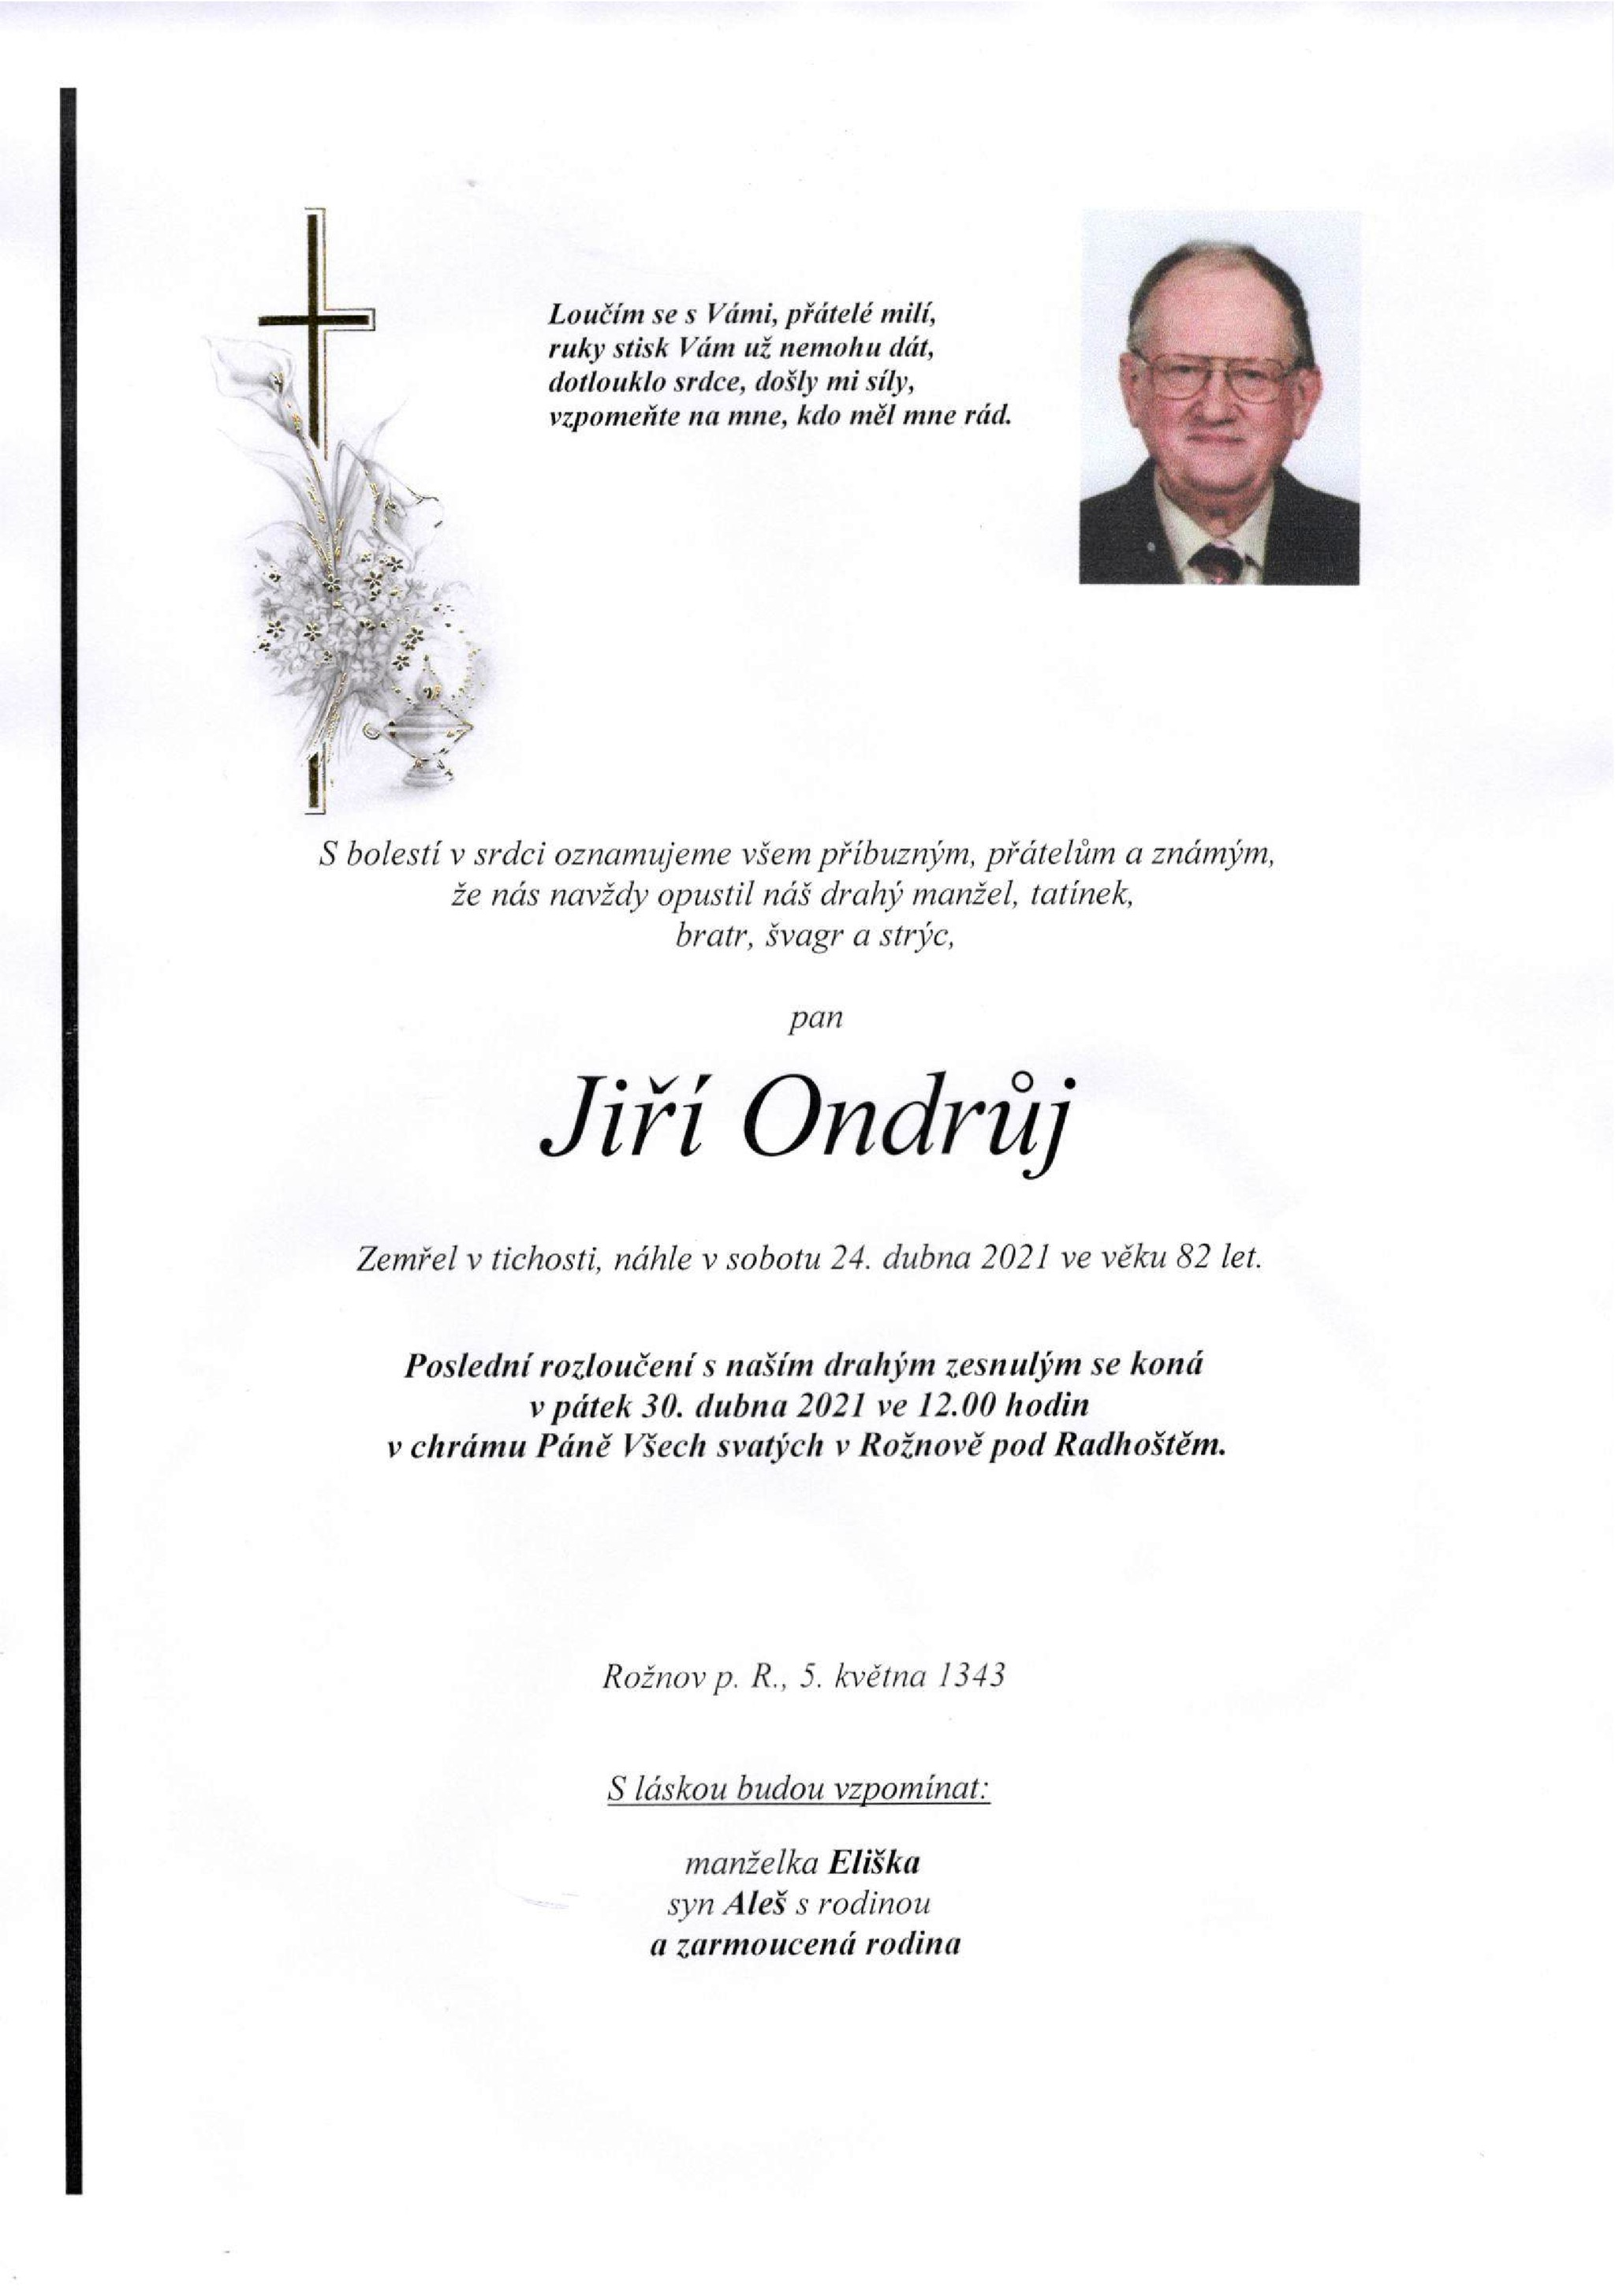 Jiří Ondrůj